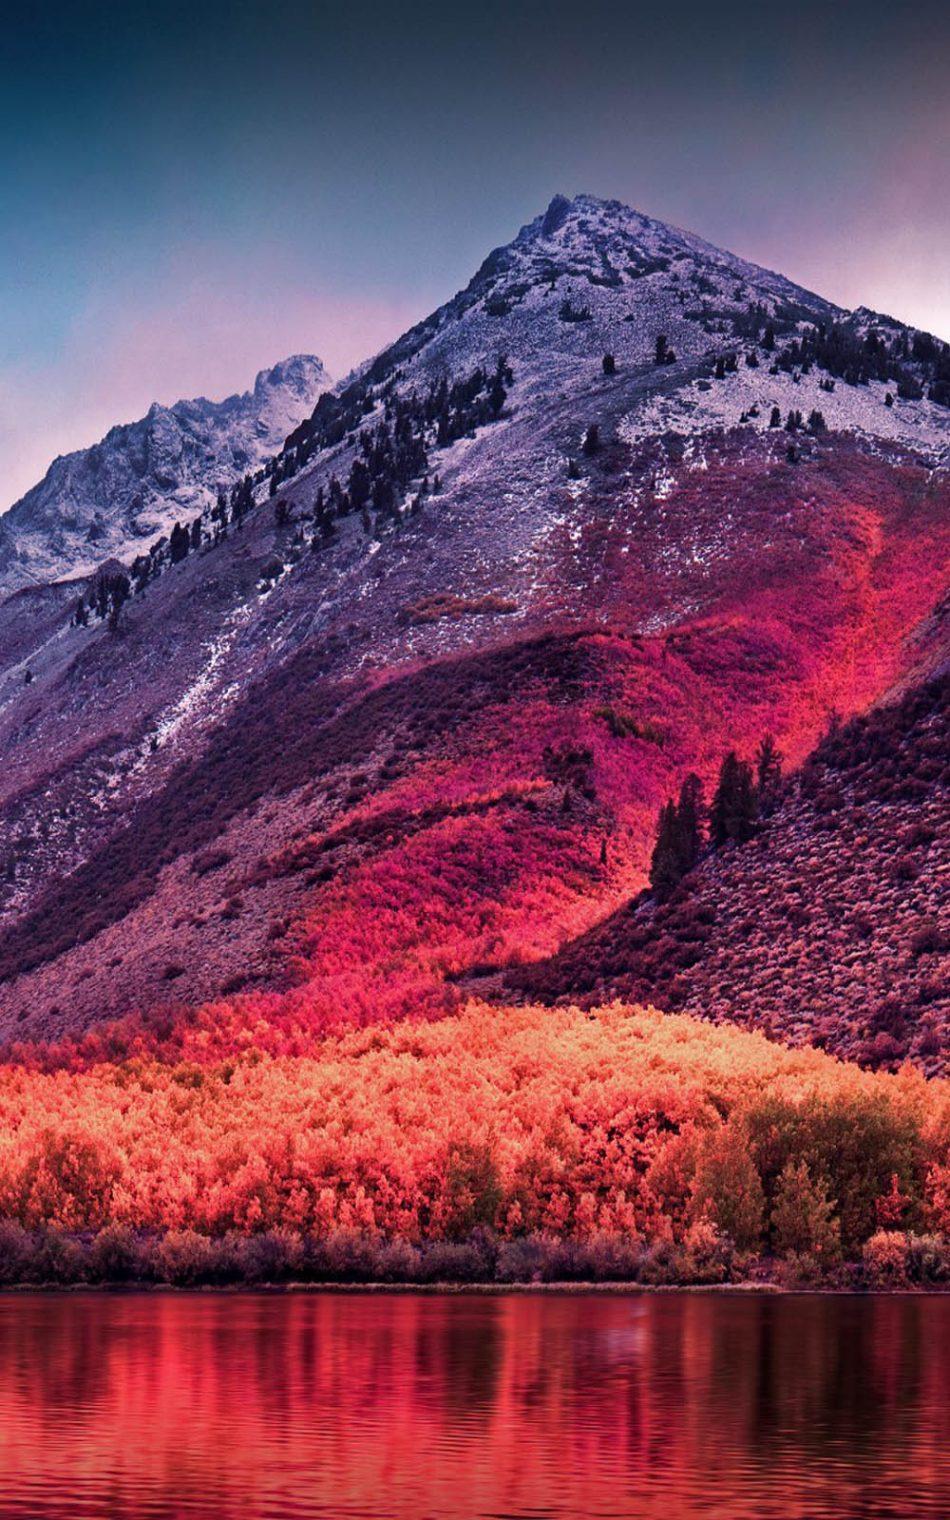 Free Download Download Sierra Nevada Mountains Landscape